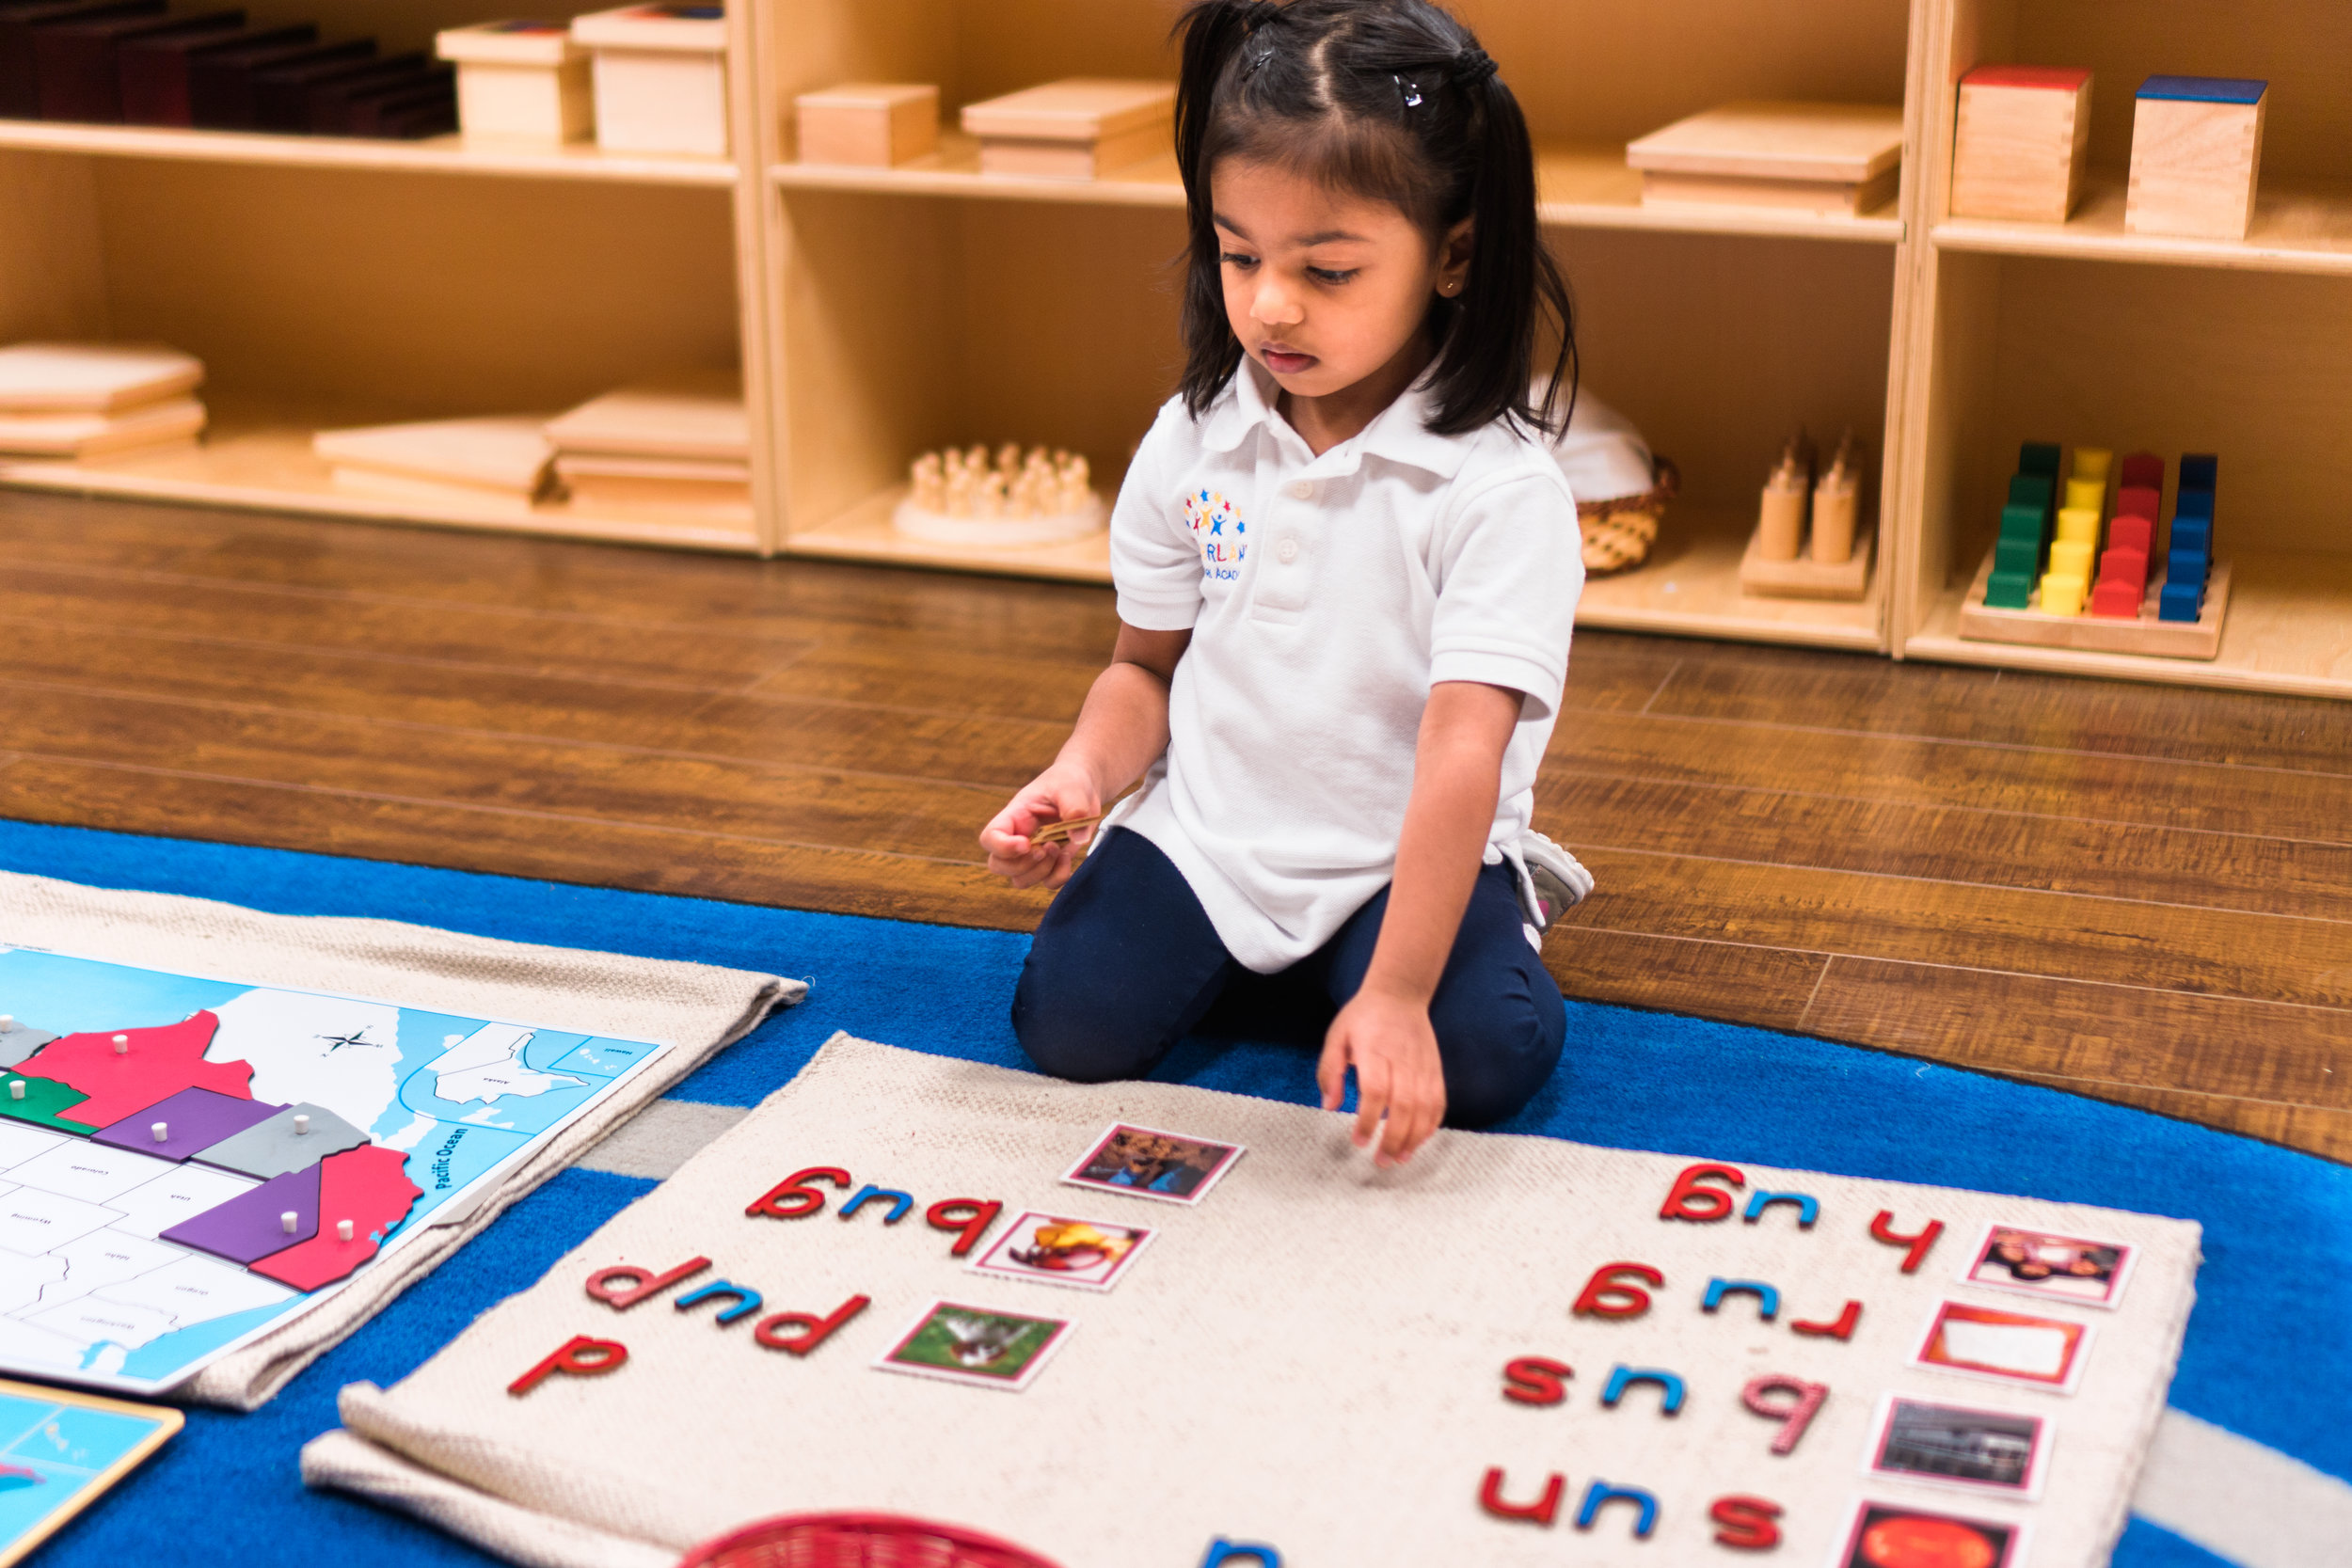 Language - To exercise command over spoken language, phonetics, cursive writing, and reading.